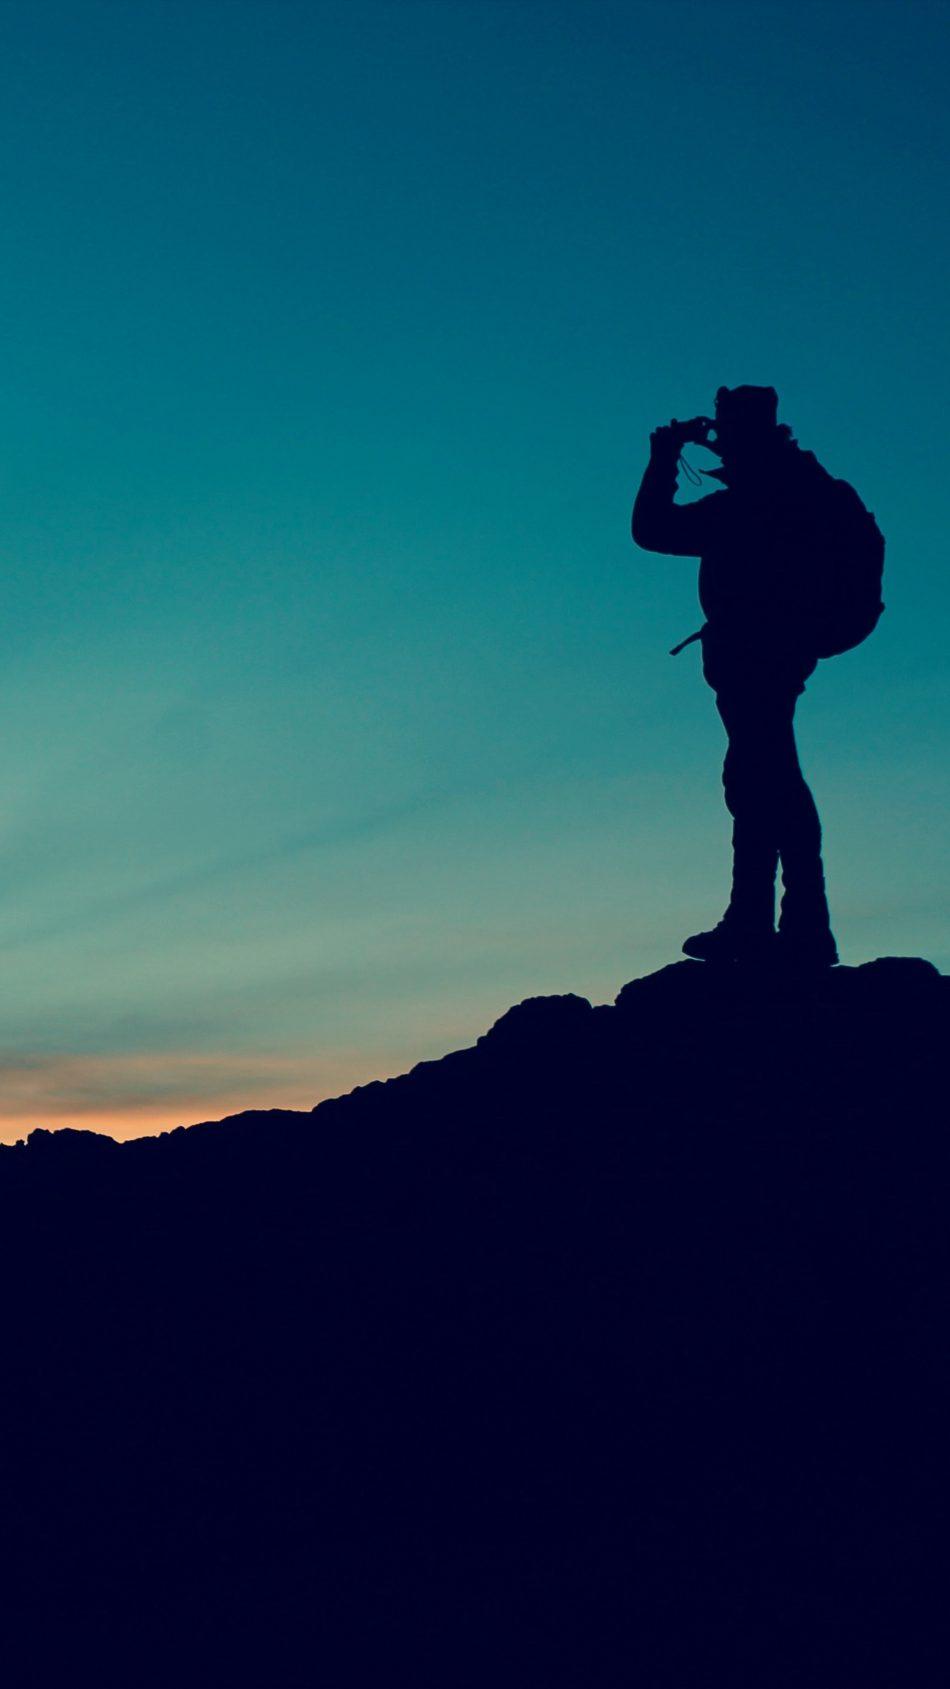 Man Photography Dusk Sunset 4K Ultra HD Mobile Wallpaper